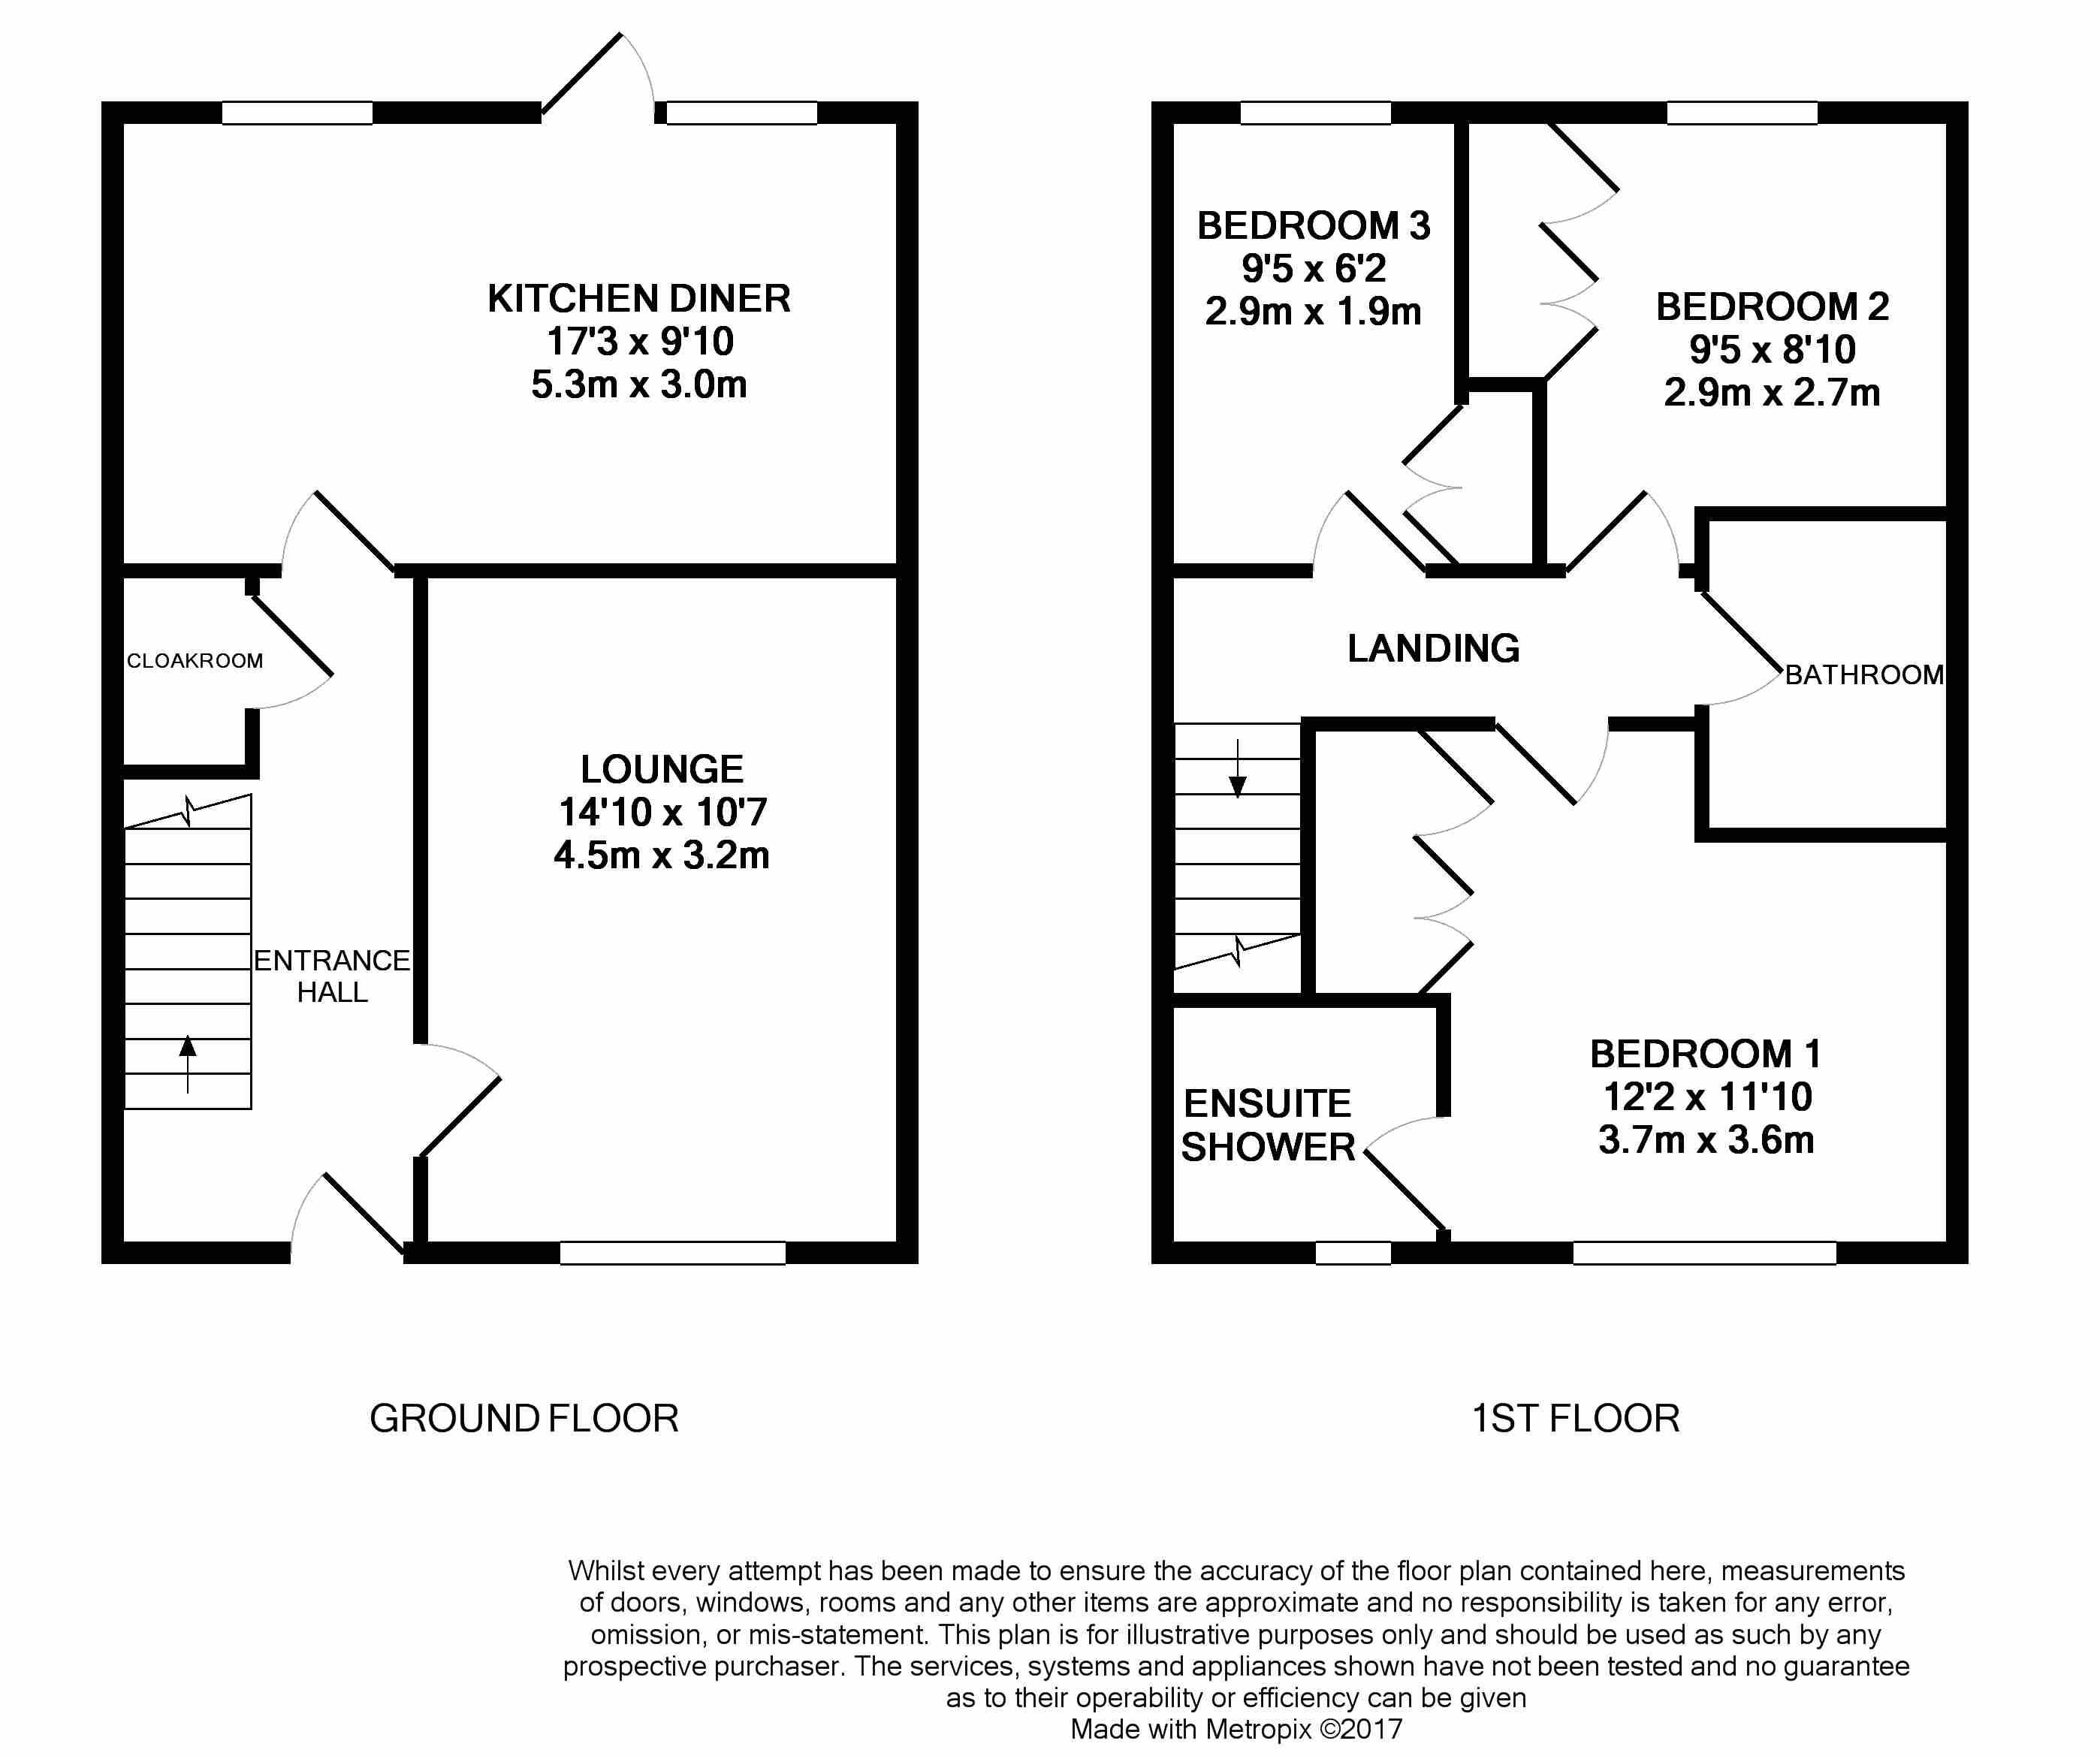 Bedroom Furniture Grimsby: Osprey Drive, Great Coates, Grimsby DN37, 3 Bedroom